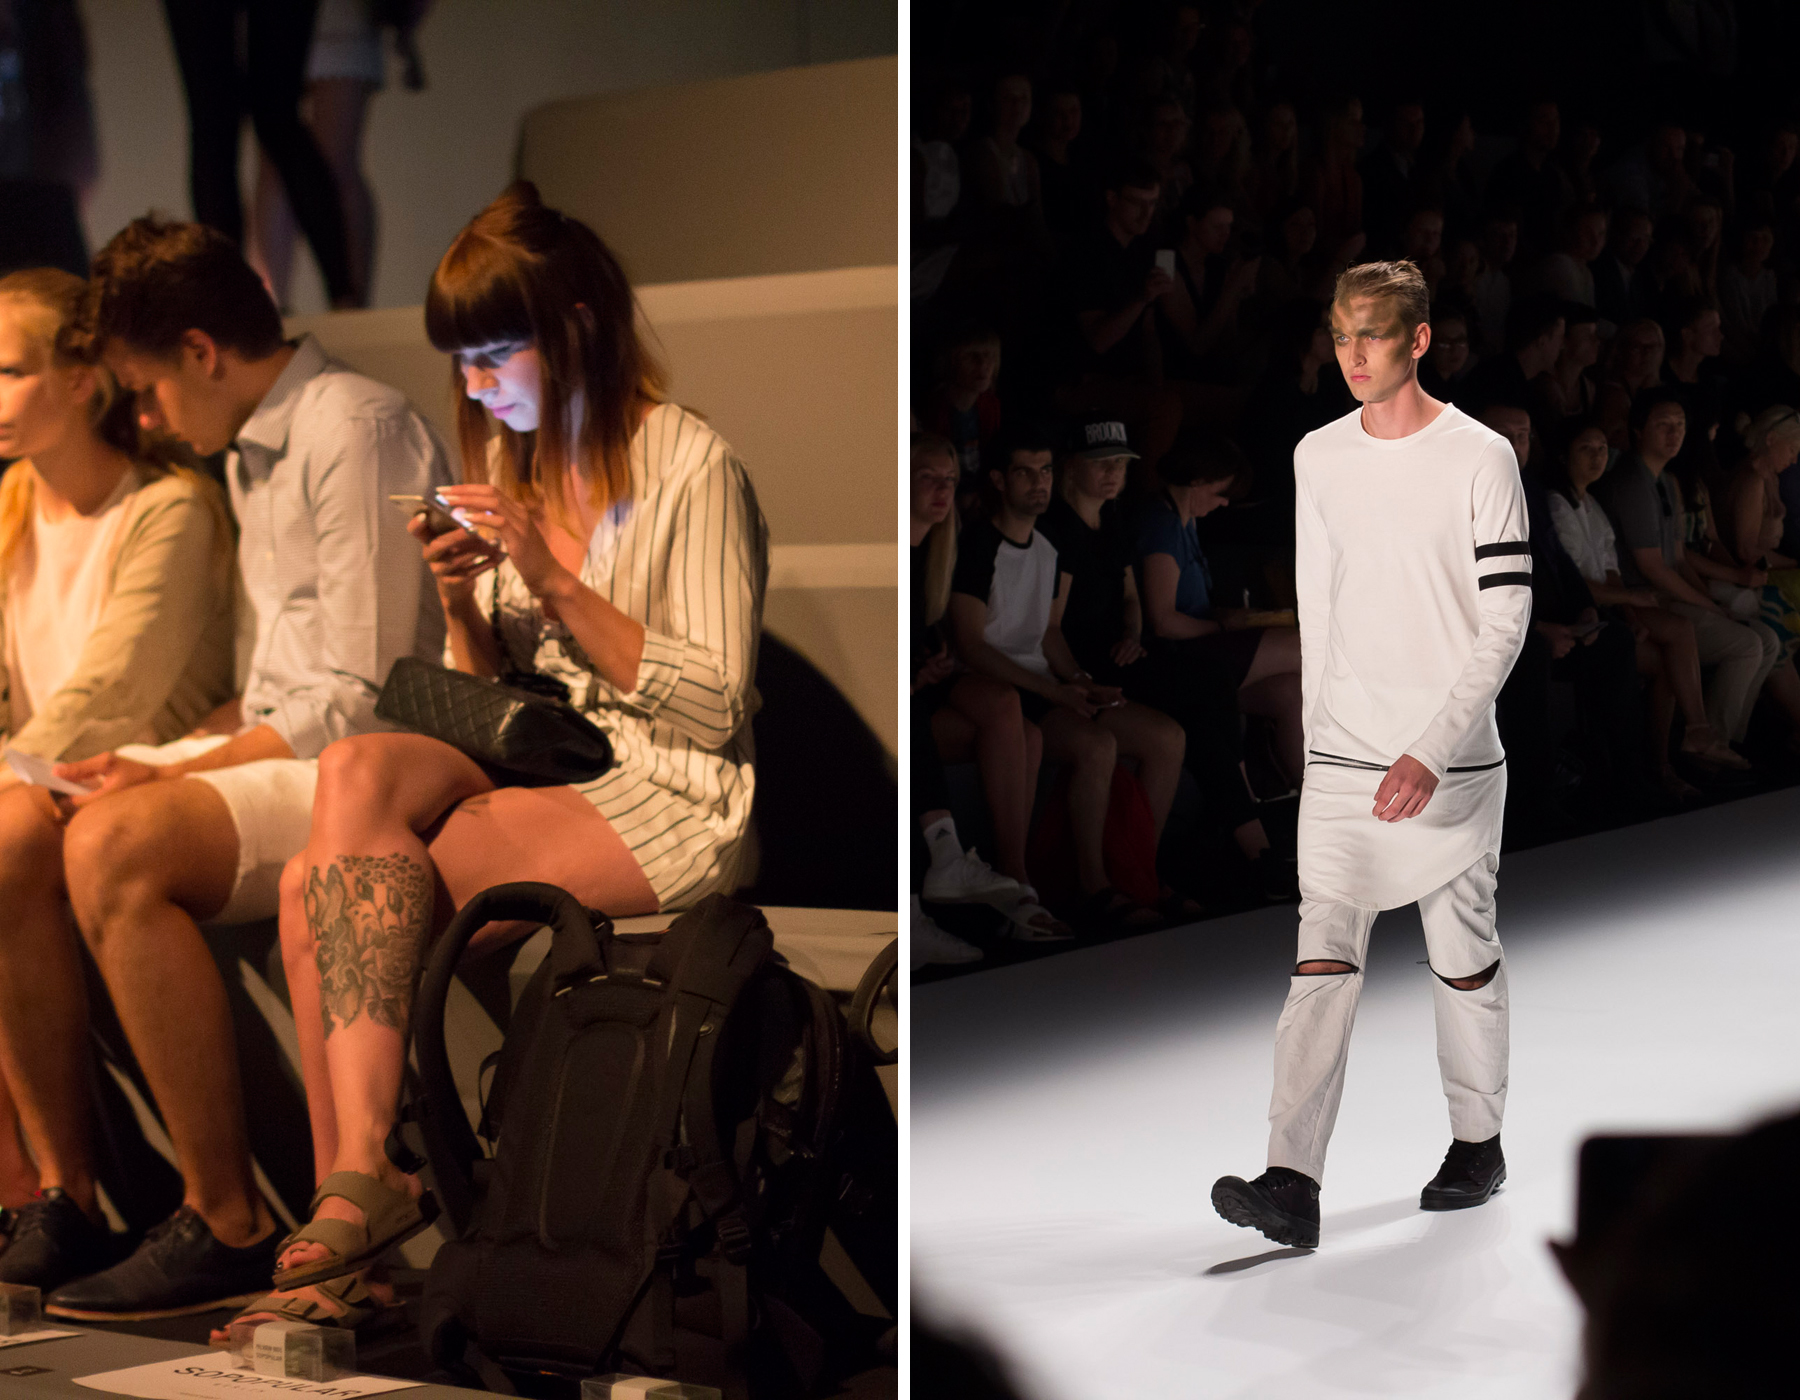 mercedes benz fashion week berlin mbfwb ss 2016 recap cats & dogs fashion blog ricarda schernus 18